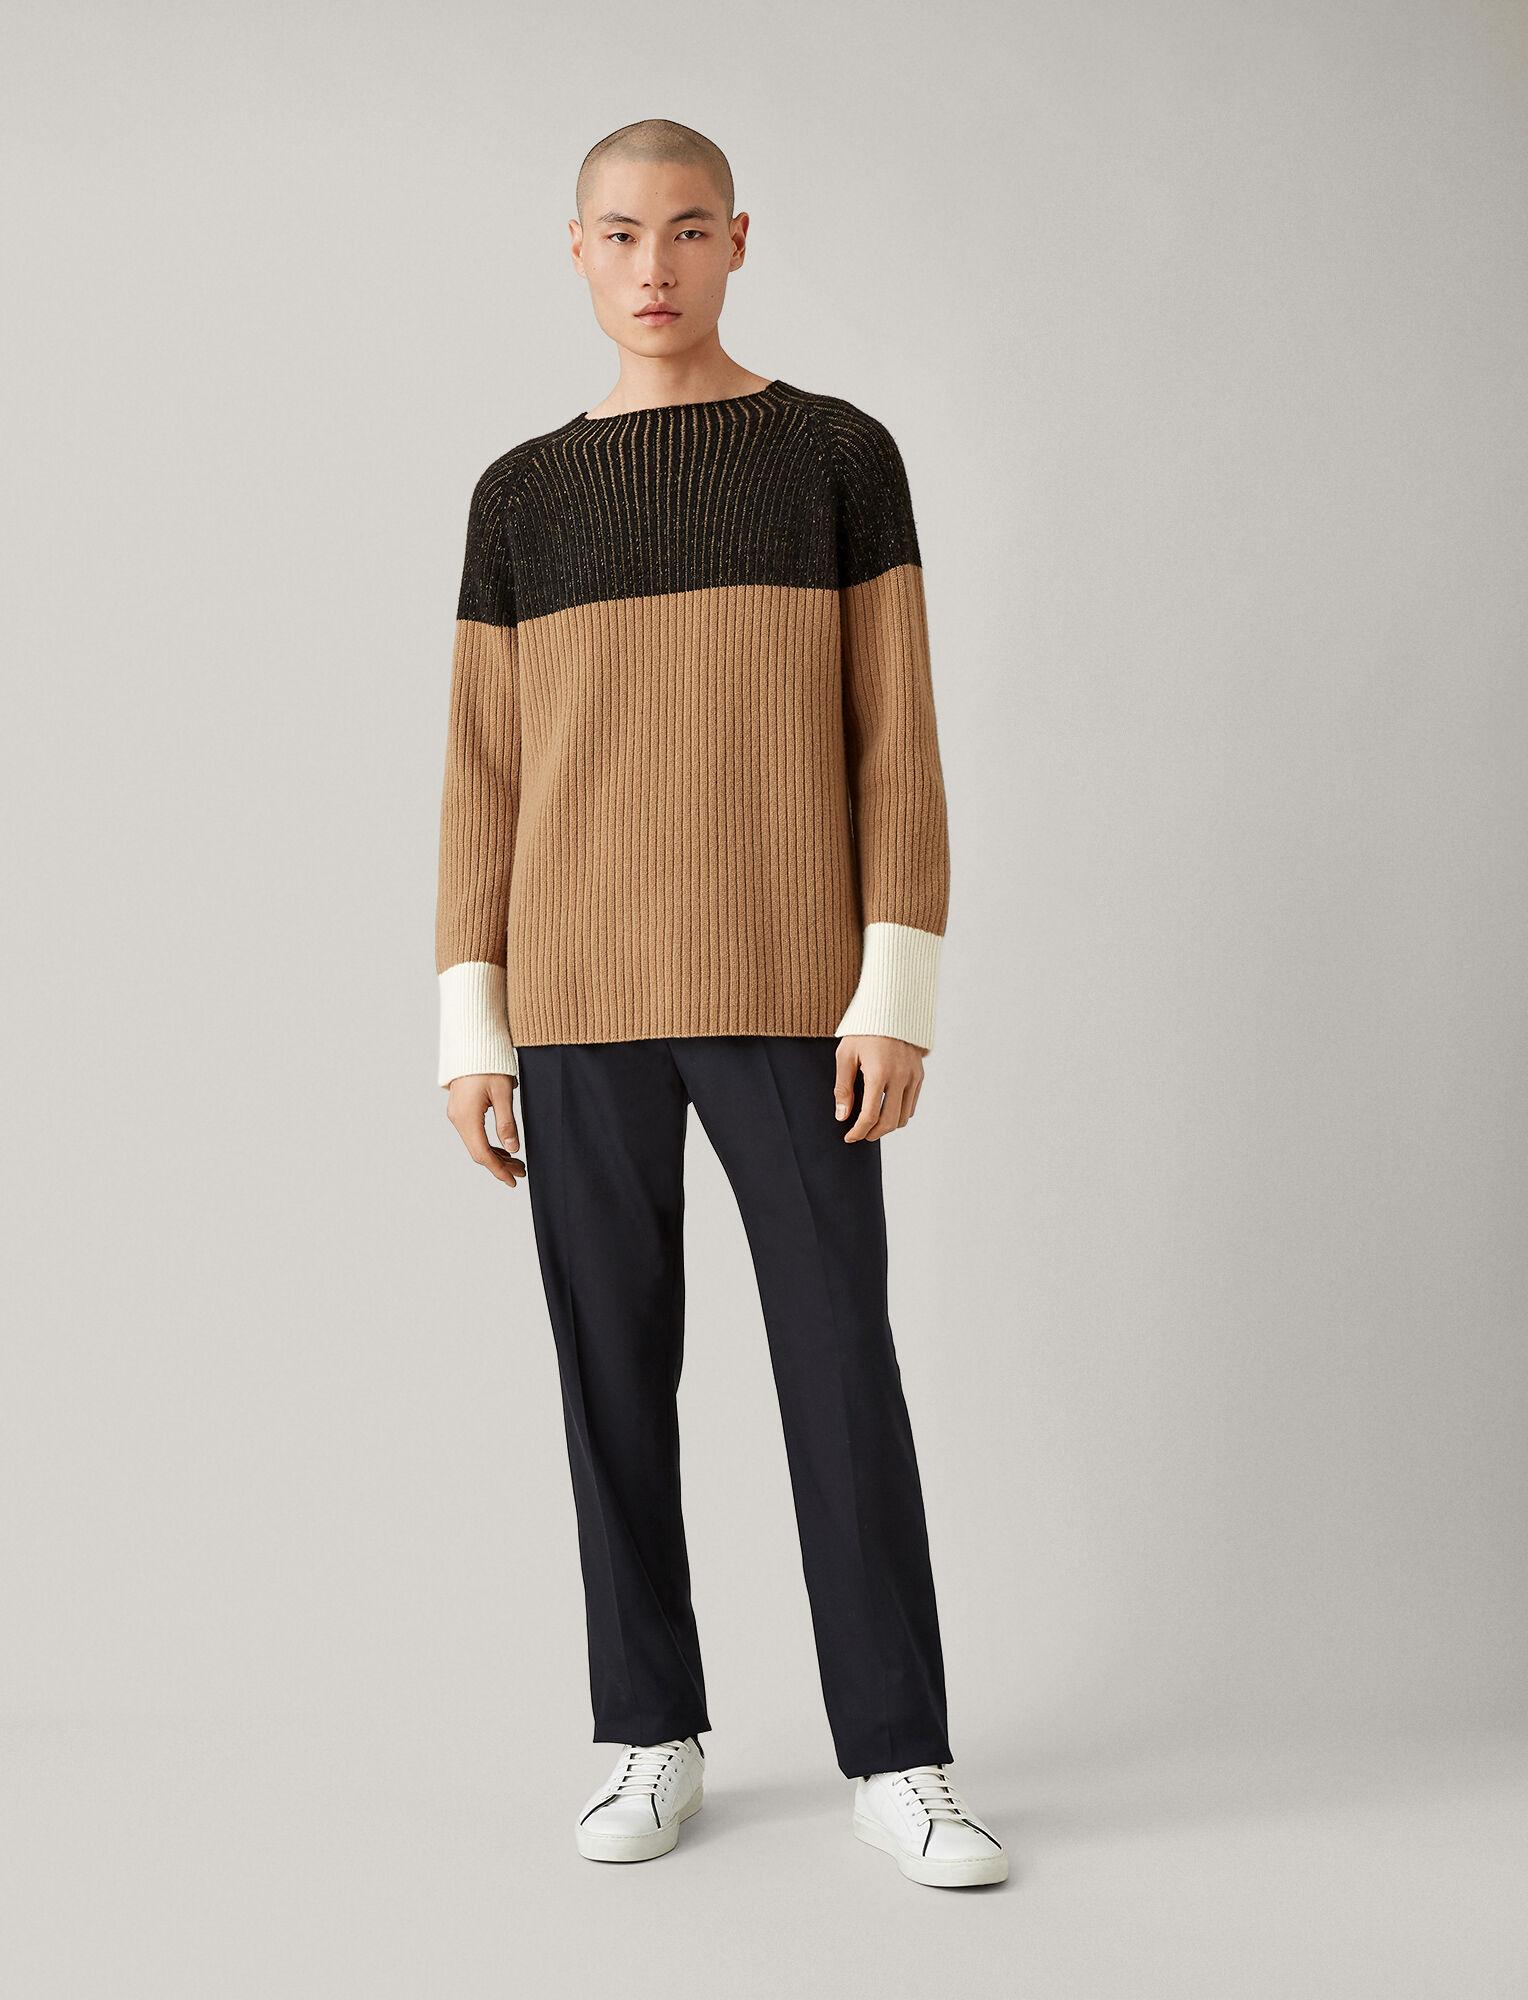 Joseph, Soft Wool Block Knit, in BLACK COMBO